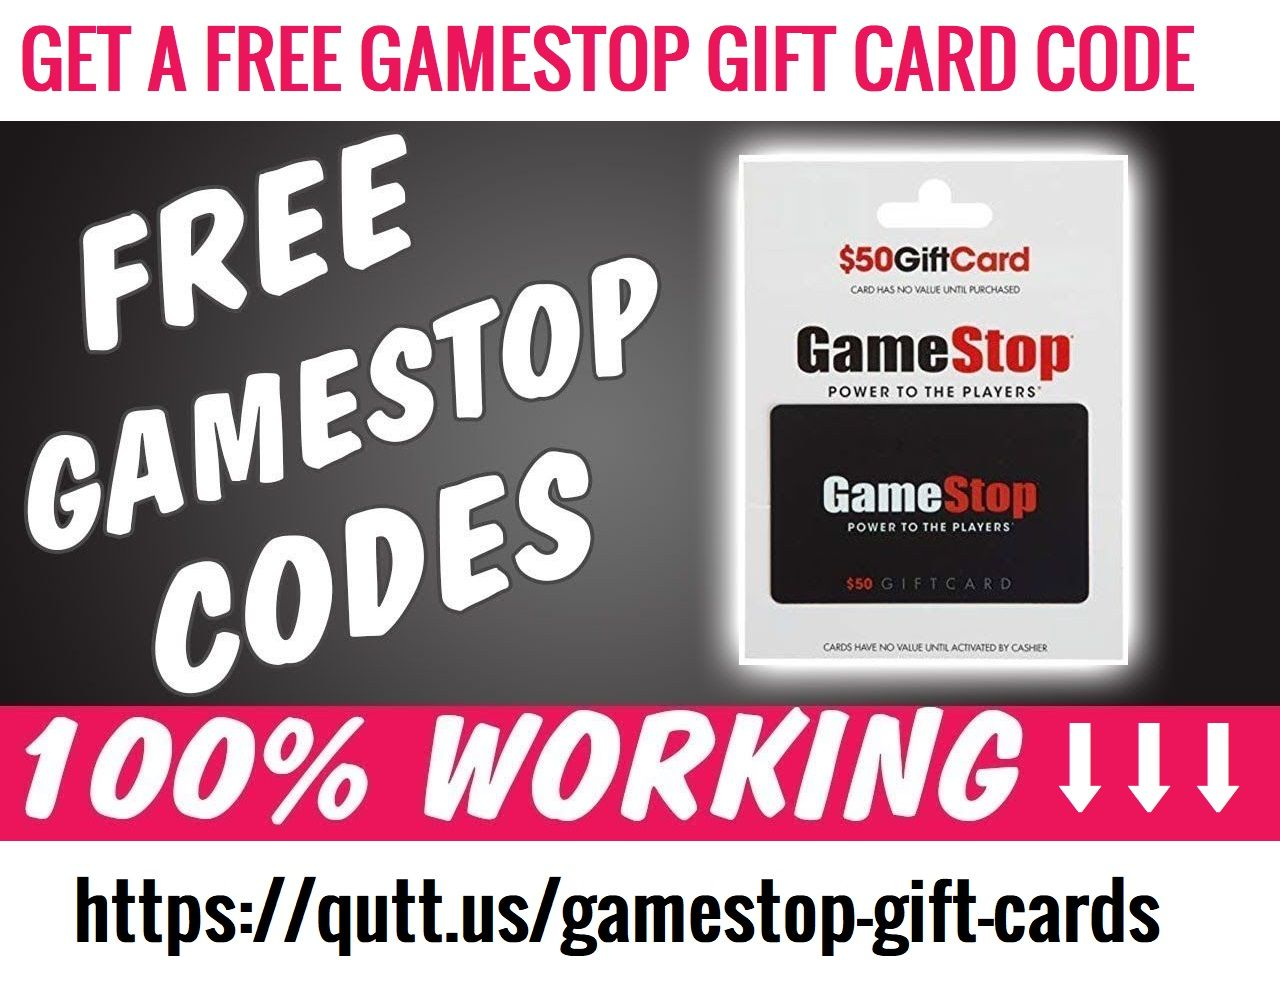 Gamestop gift card codes redeem generator 100 working